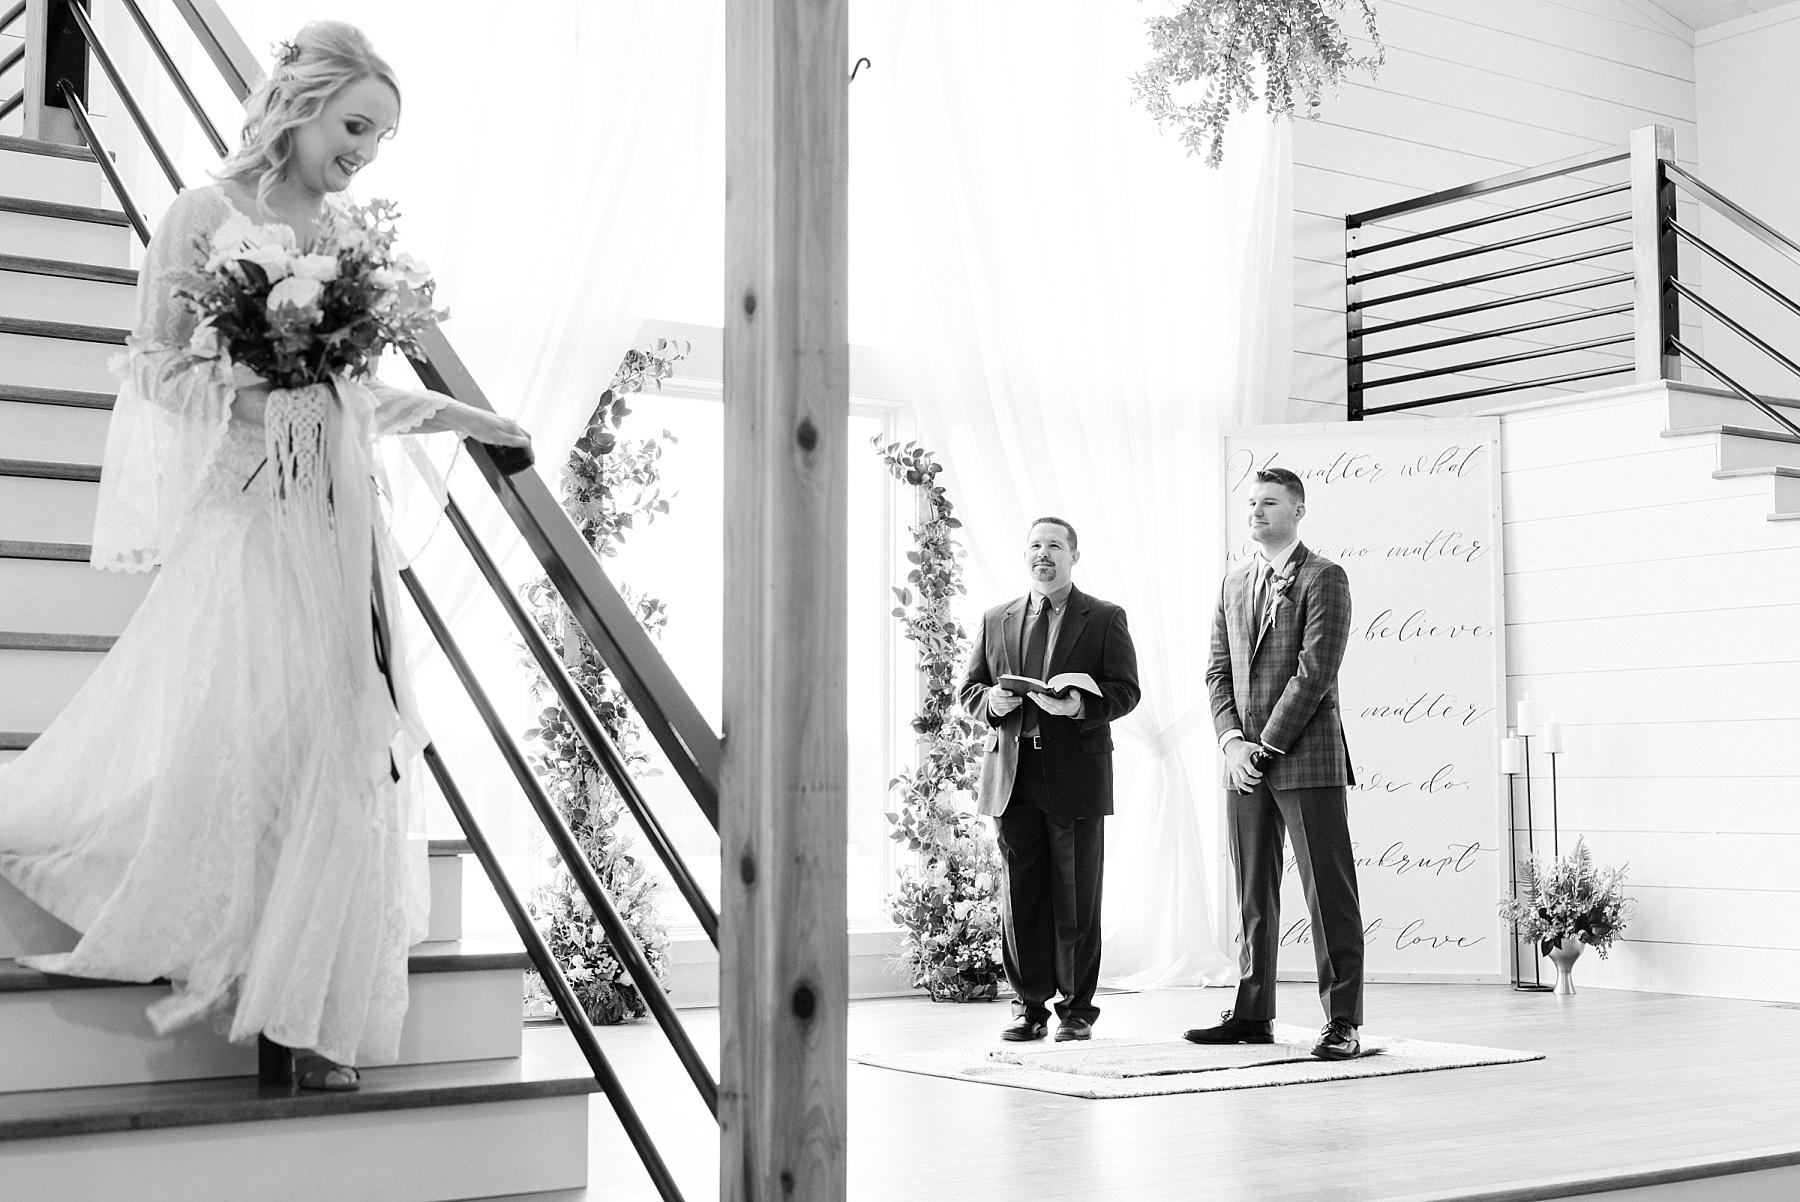 Eclectic Scandinavian Winter Wedding in All White Venue Emerson Fields by Kelsi Kliethermes Photography Best Missouri and Maui Wedding Photographer_0037.jpg